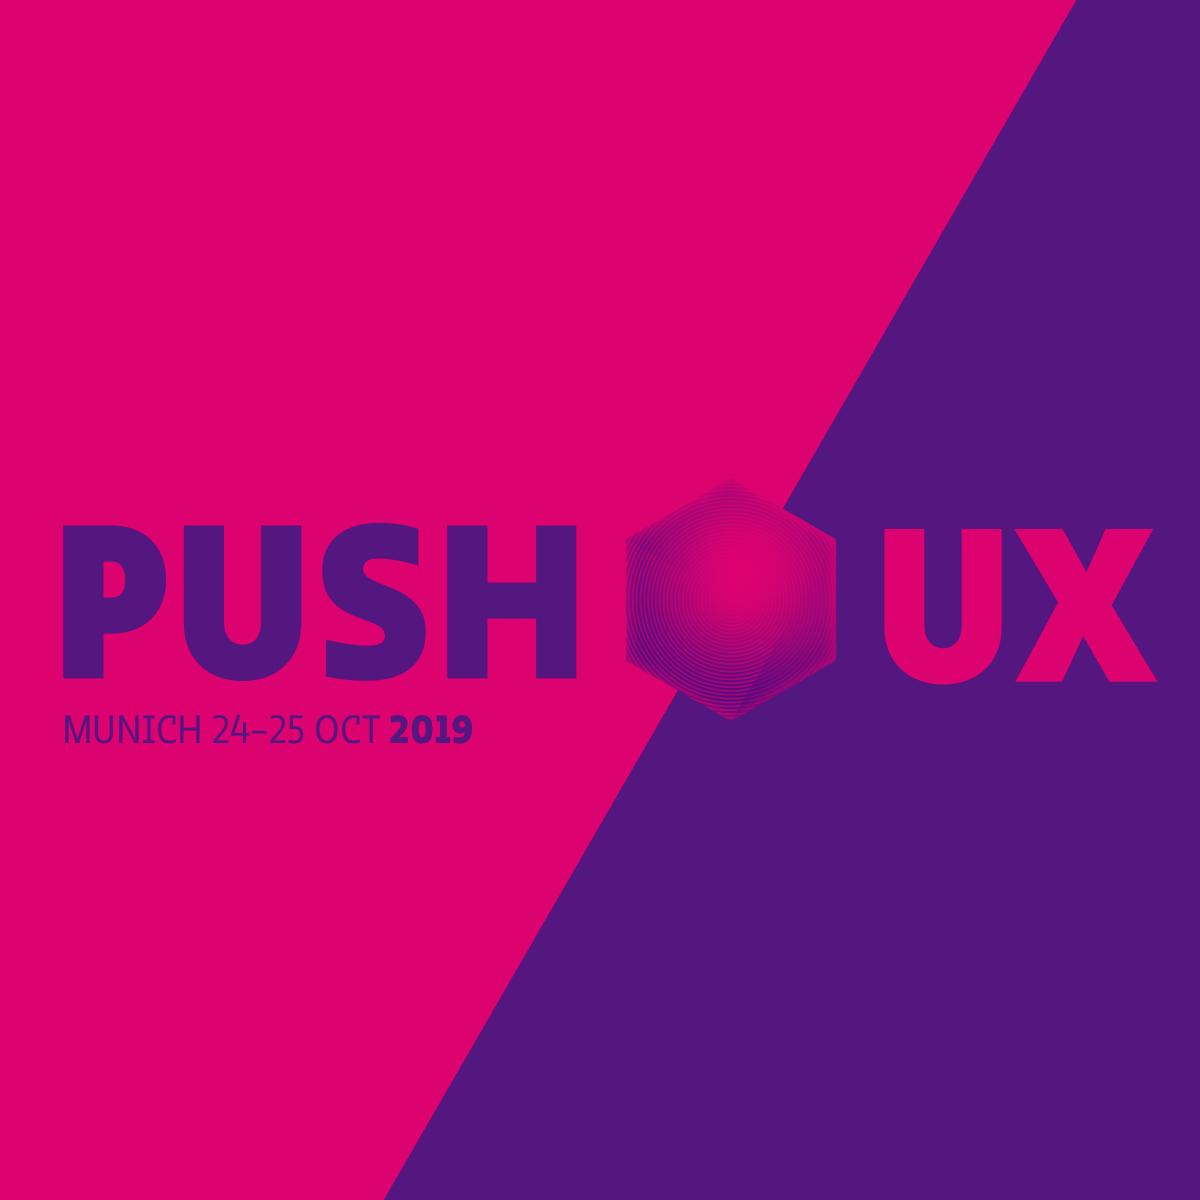 PUSH UX 2019